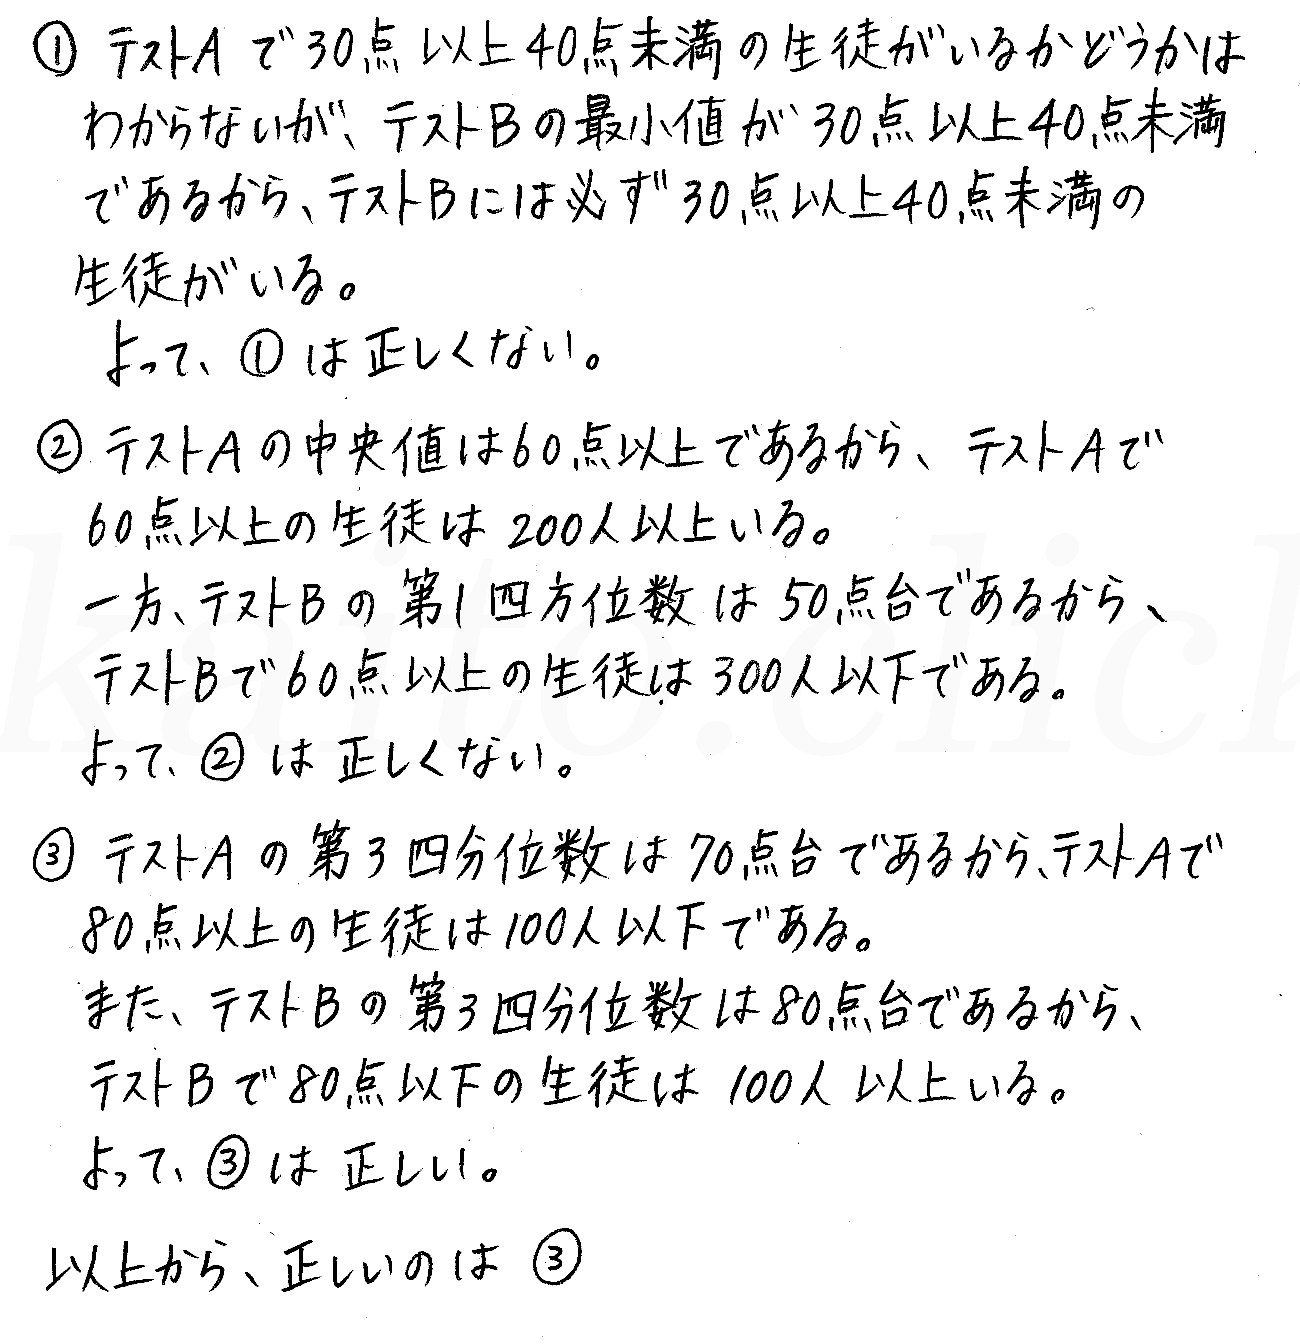 3TRIAL数学Ⅰ-284解答